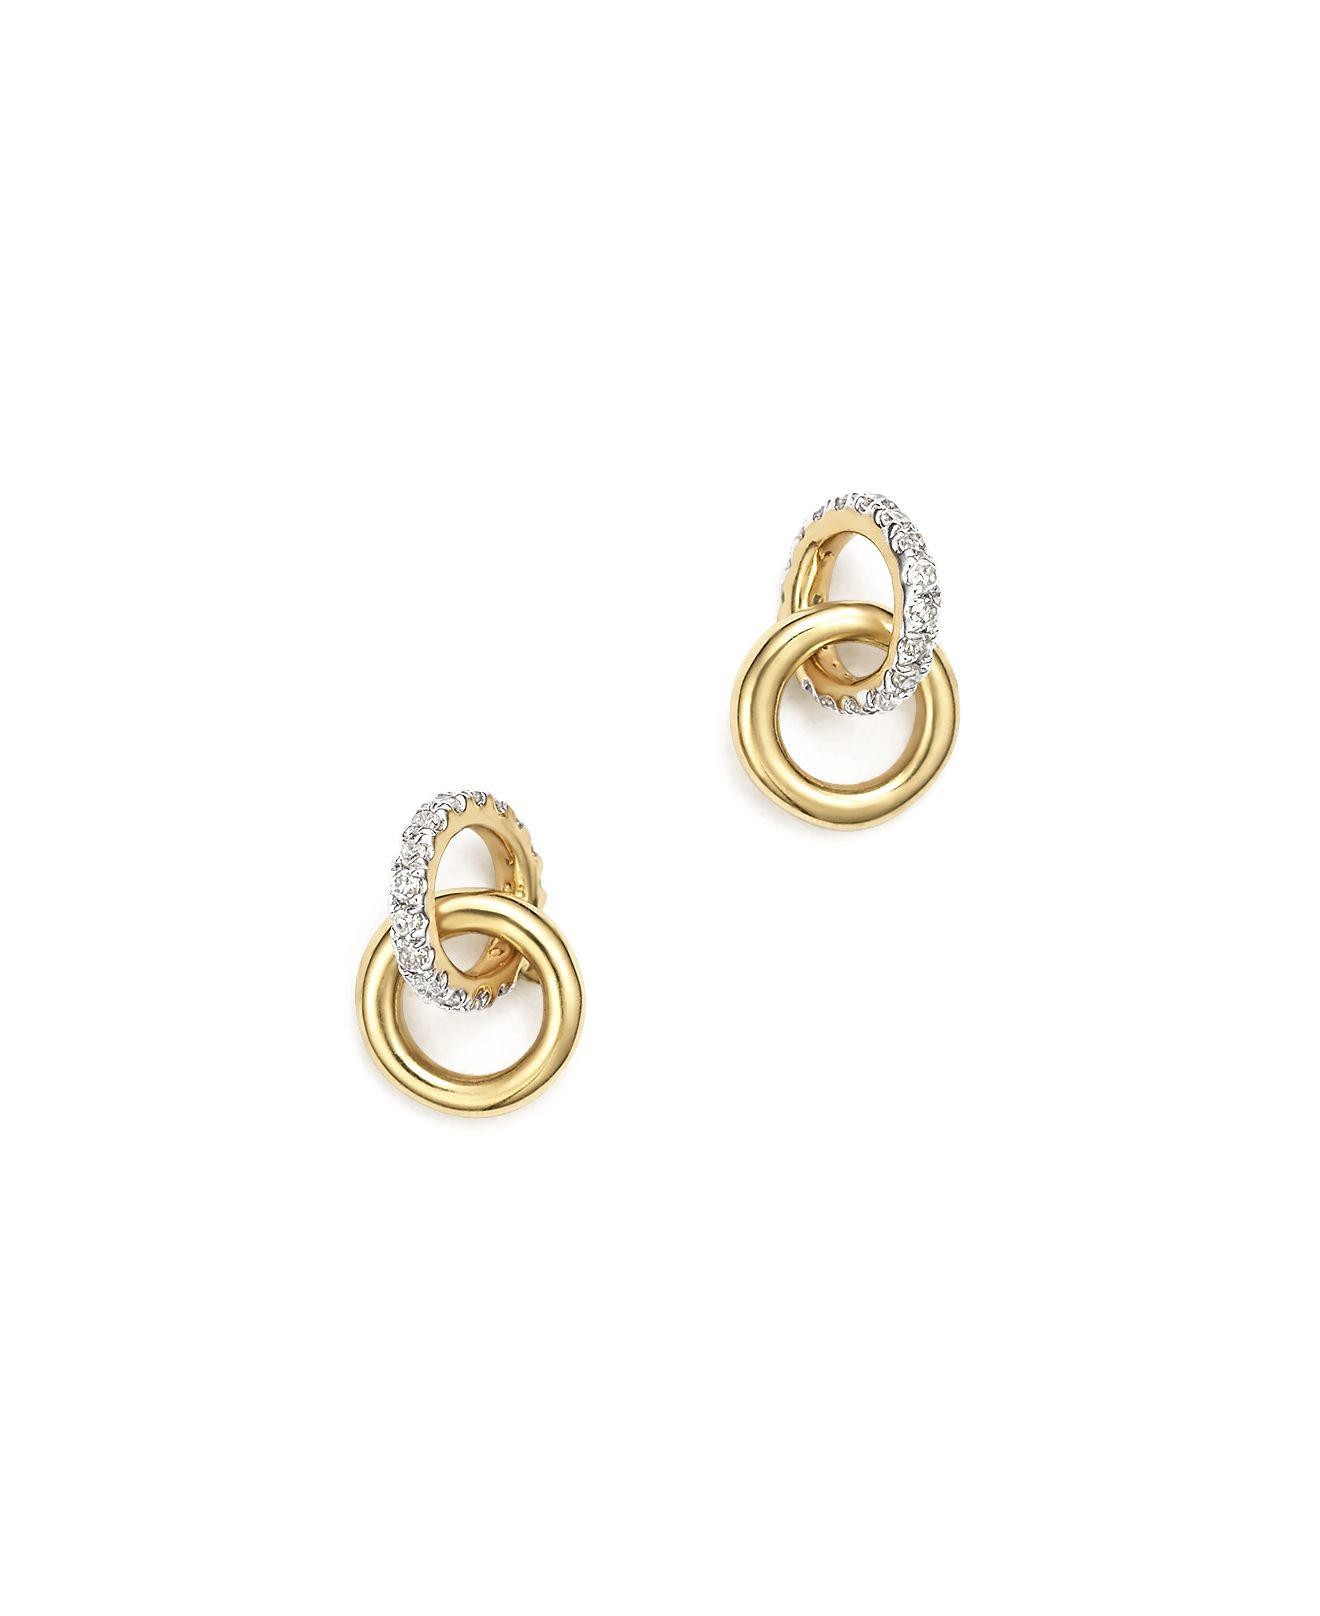 Adina Reyter 14k Diamond Interlocking Loop Post Earrings f9wJtzn